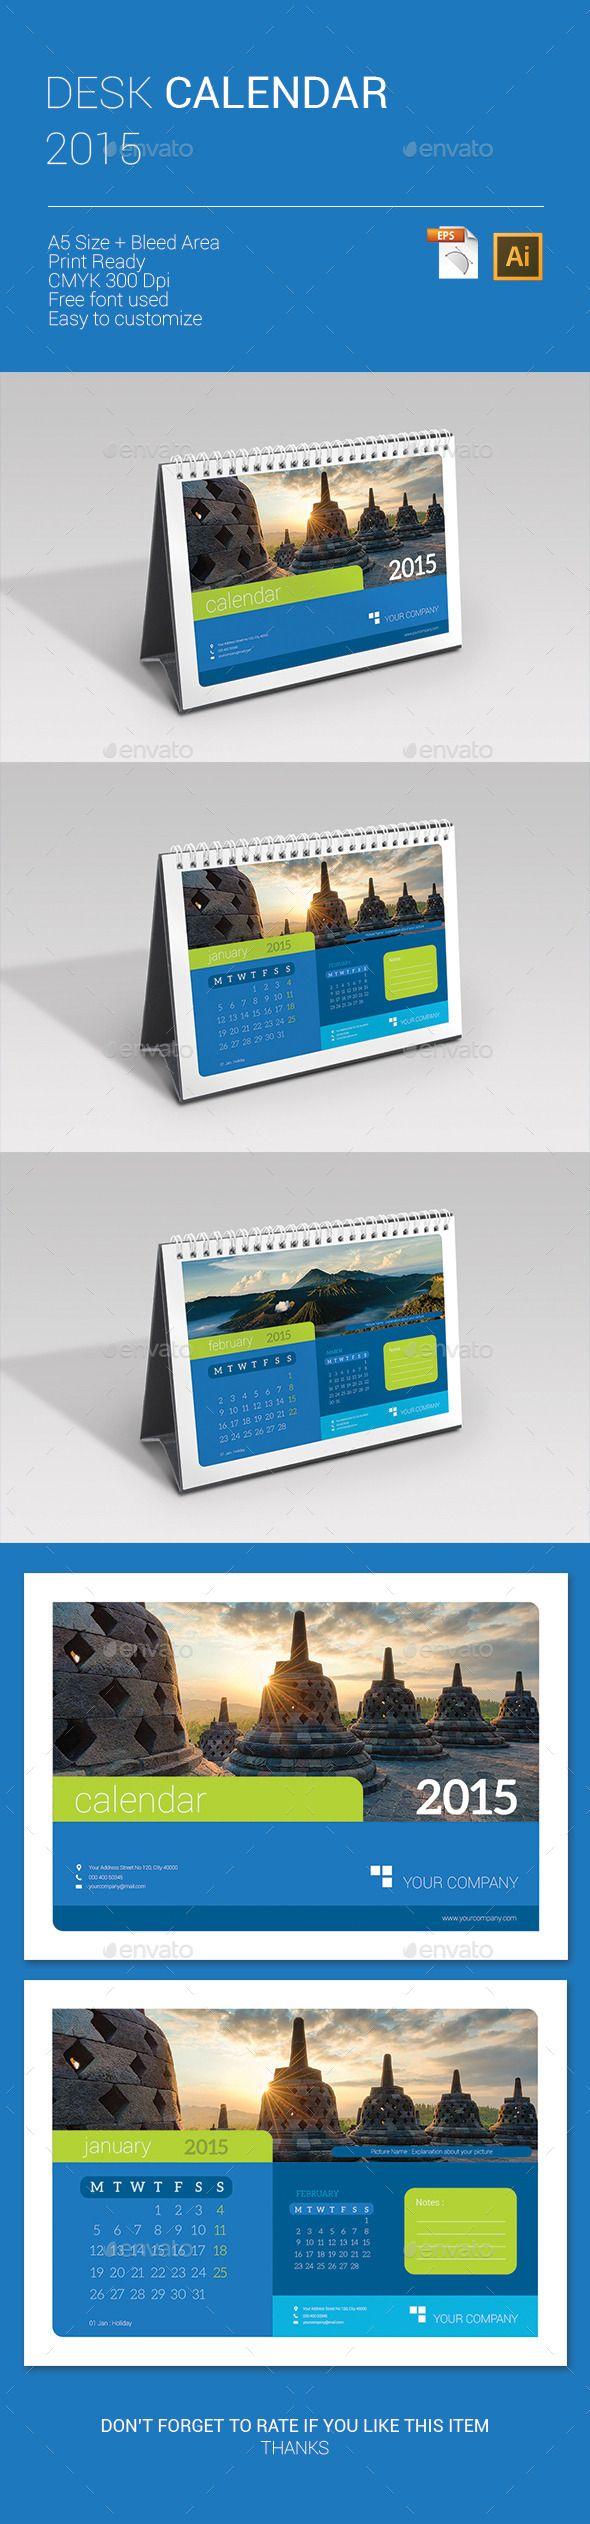 Desk Calendar 2015 Template   Buy and Download: http://graphicriver.net/item/desk-calendar-2015/9670840?ref=ksioks